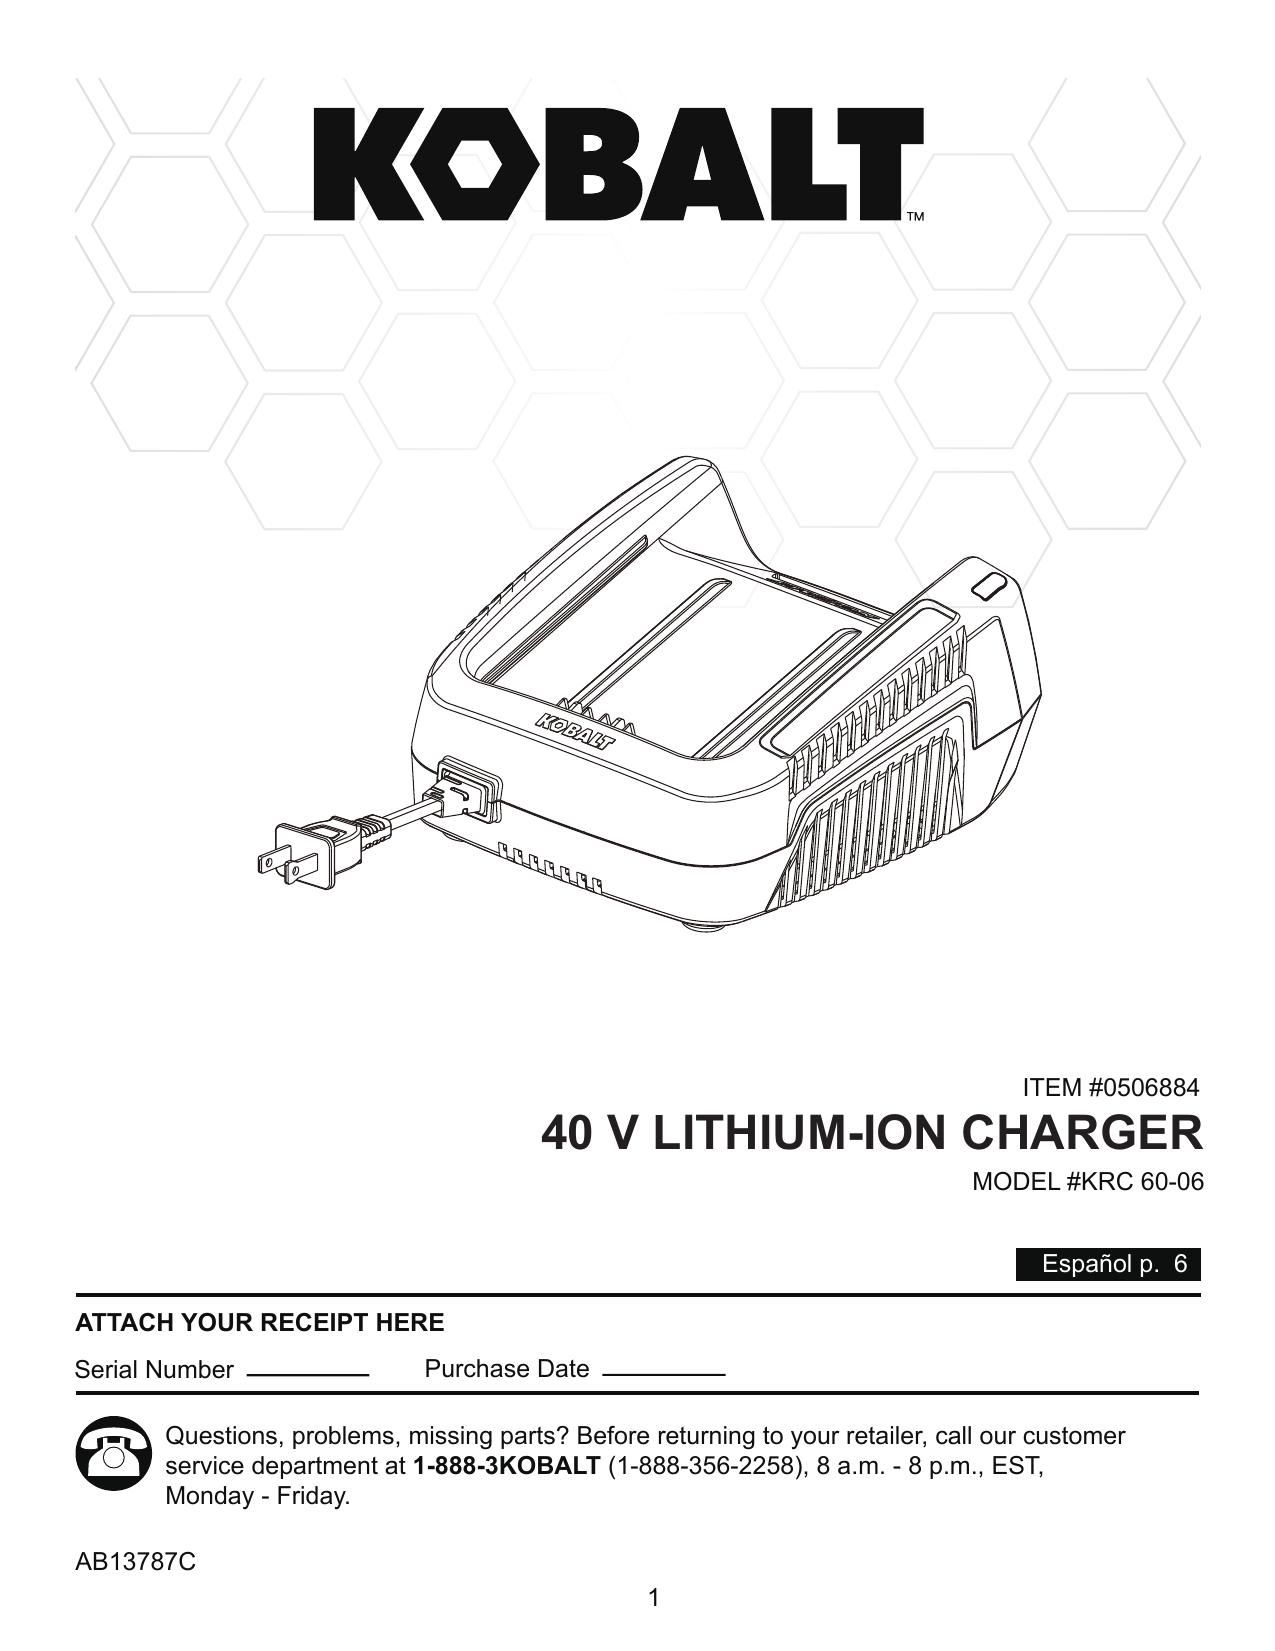 40 V LITHIUM-ION CHARGER | manualzz com